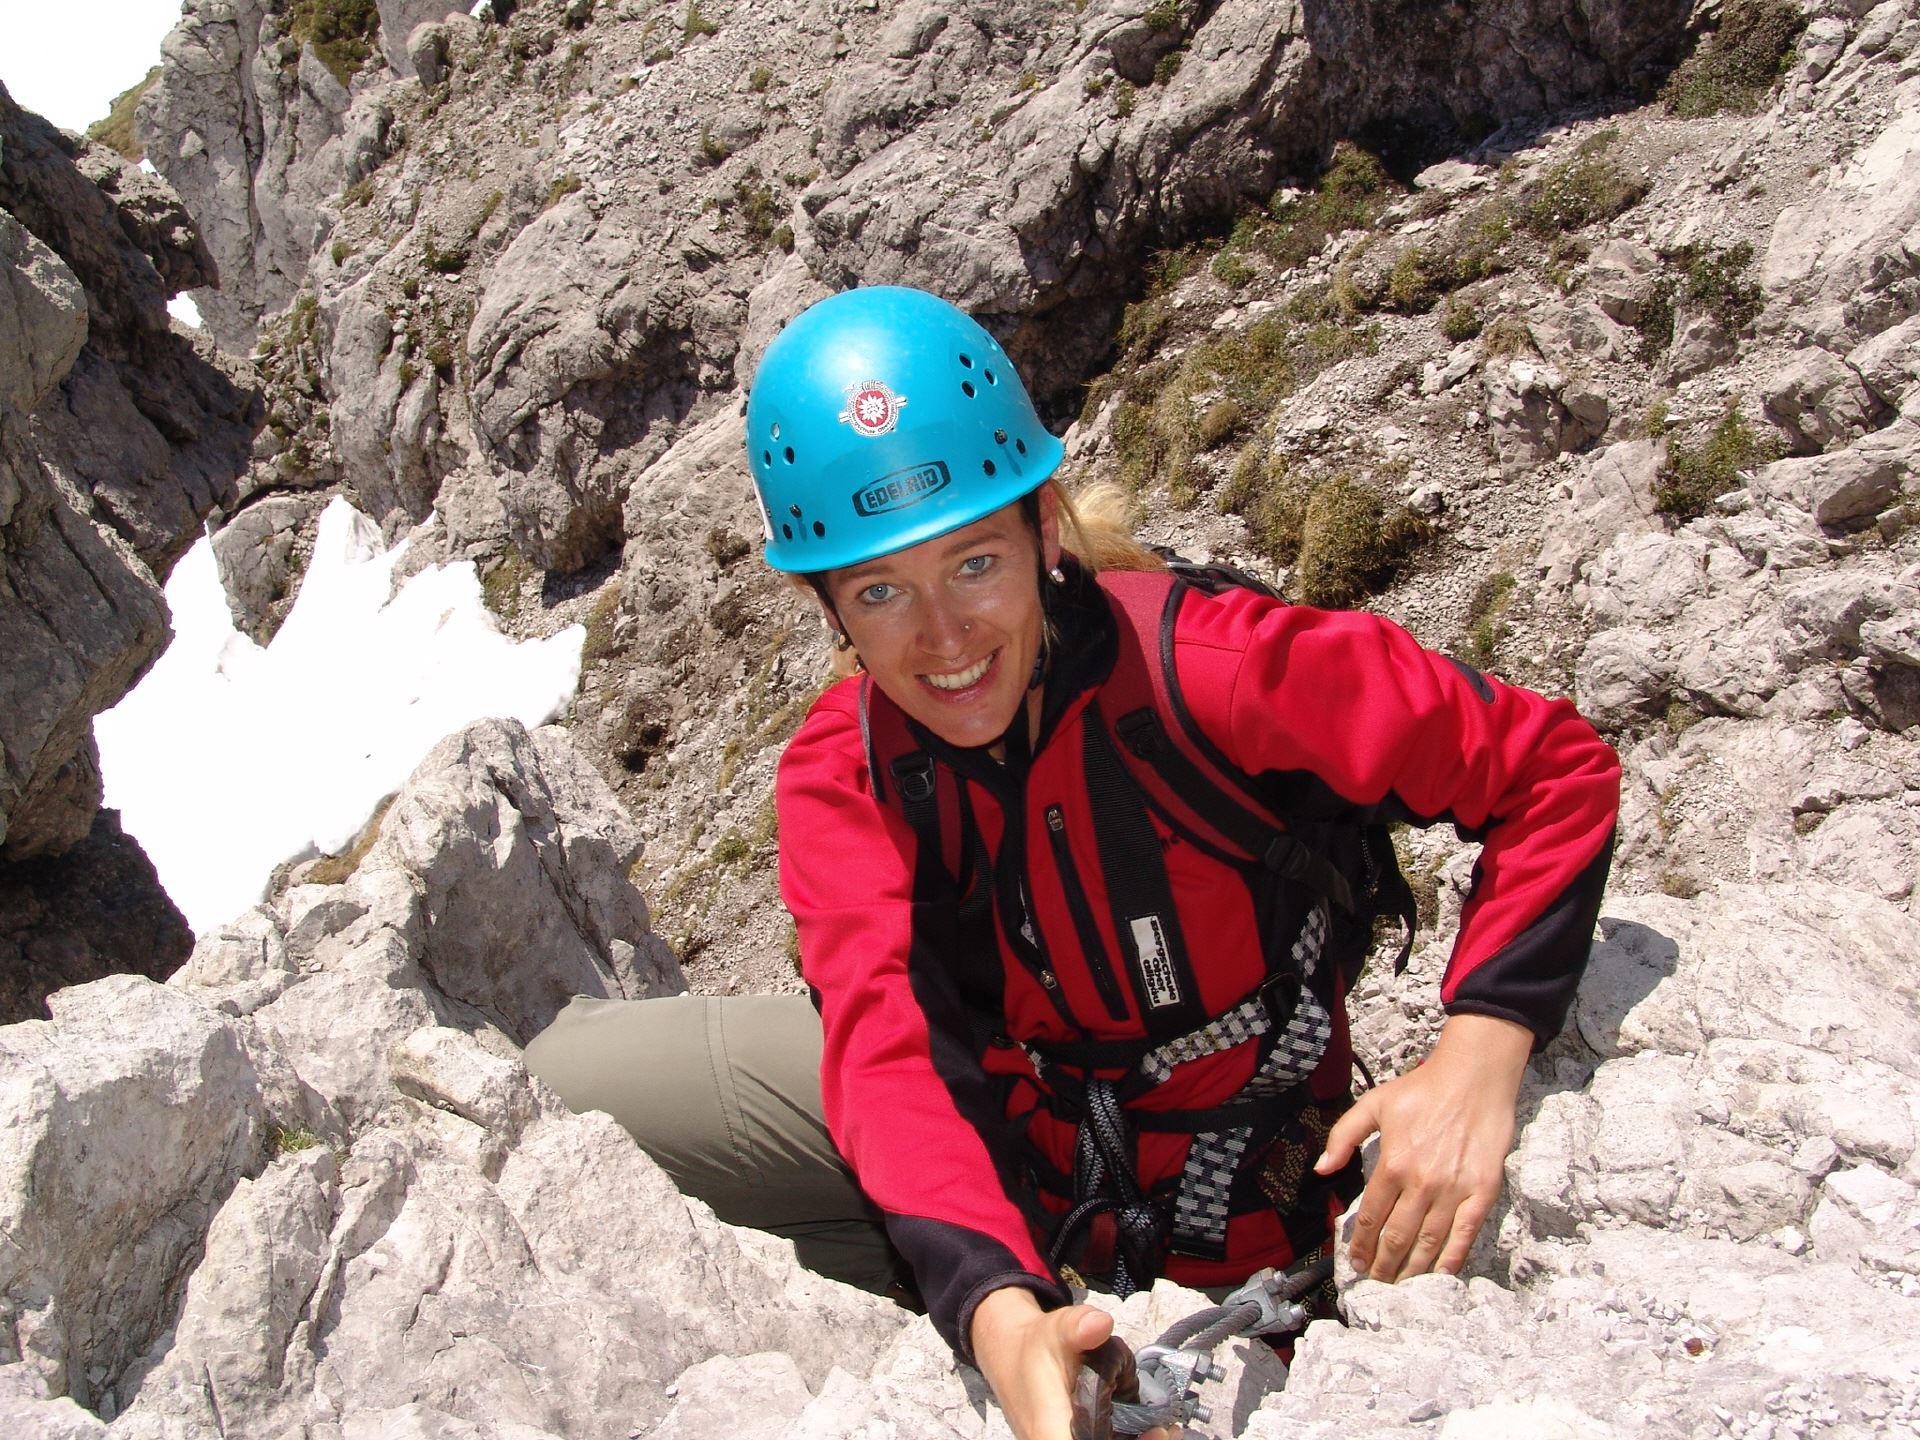 Zillertal Klettersteigset Leihen : Tagestour hindelanger klettersteig